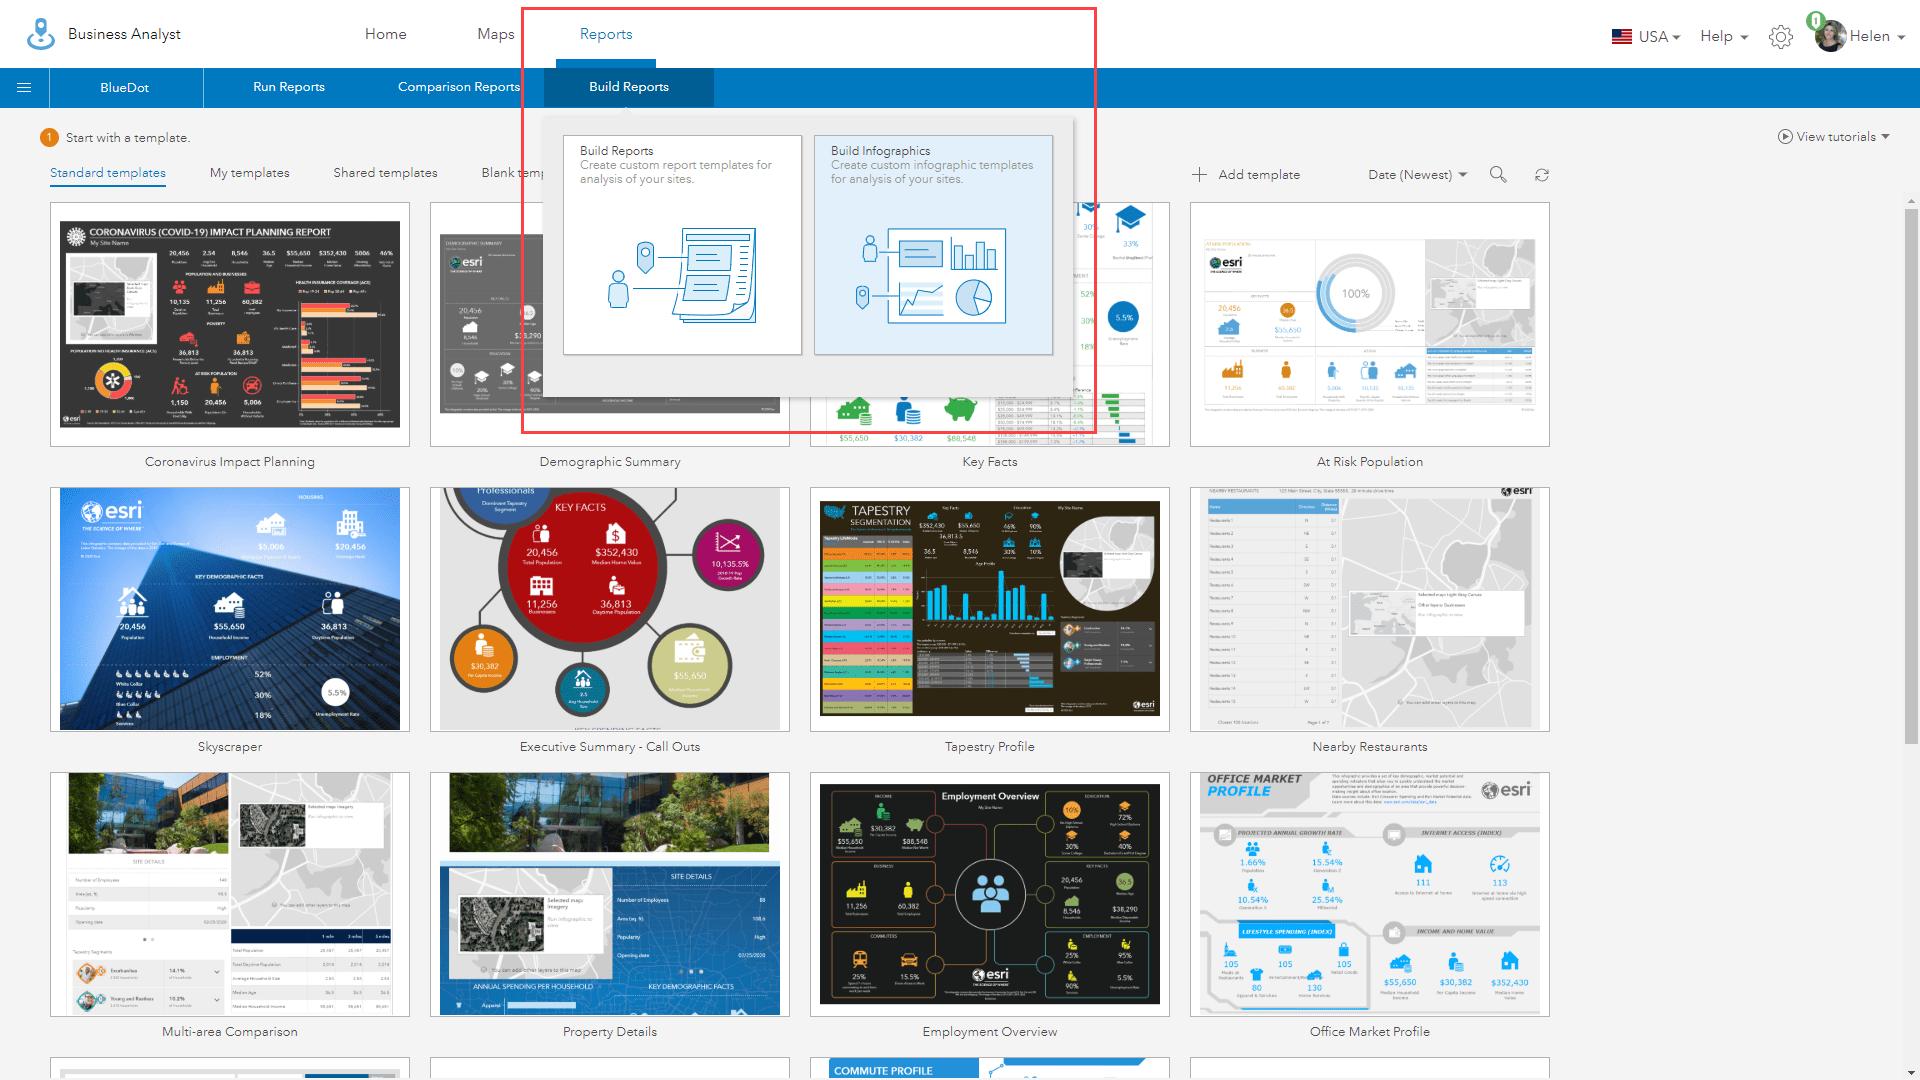 Build infographics menu